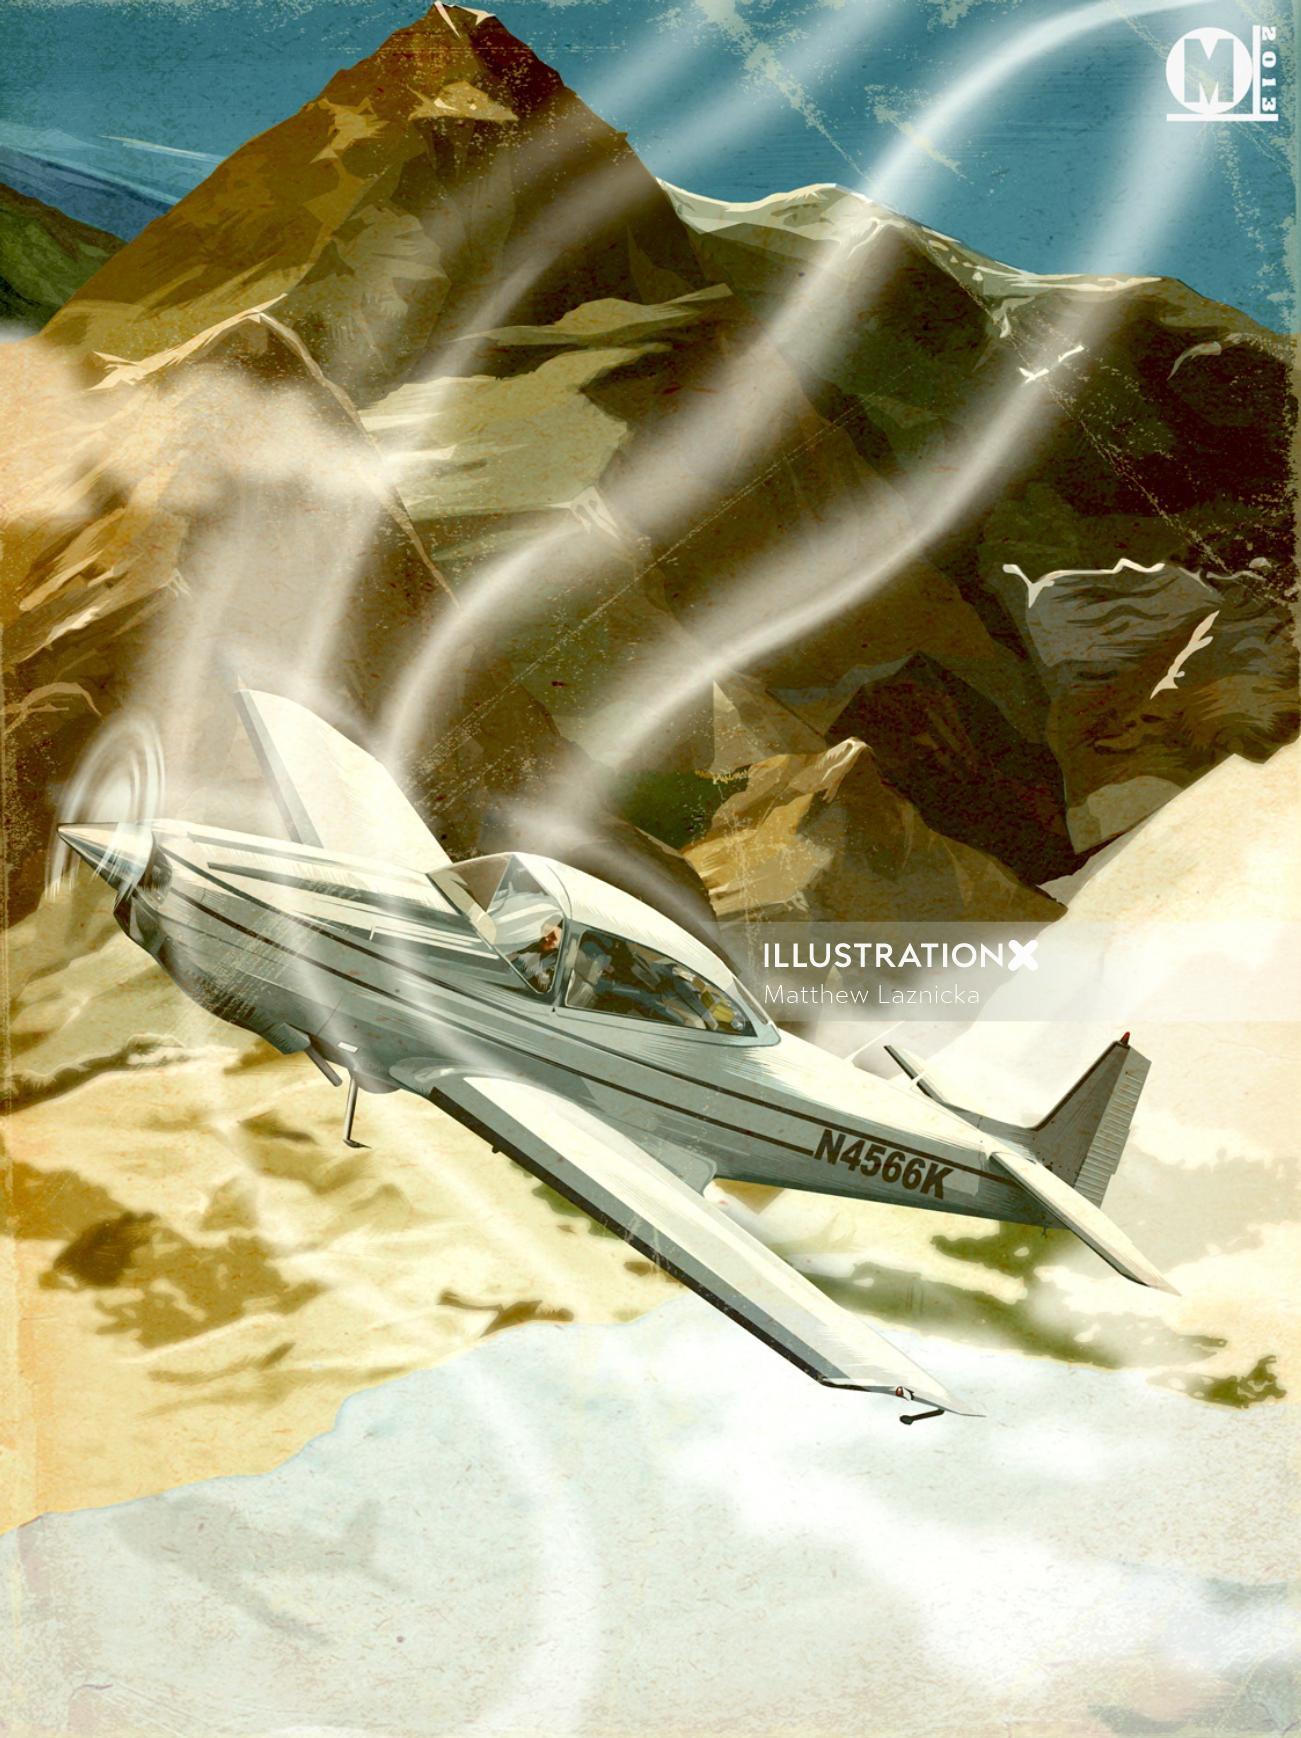 Illustration of navion plane